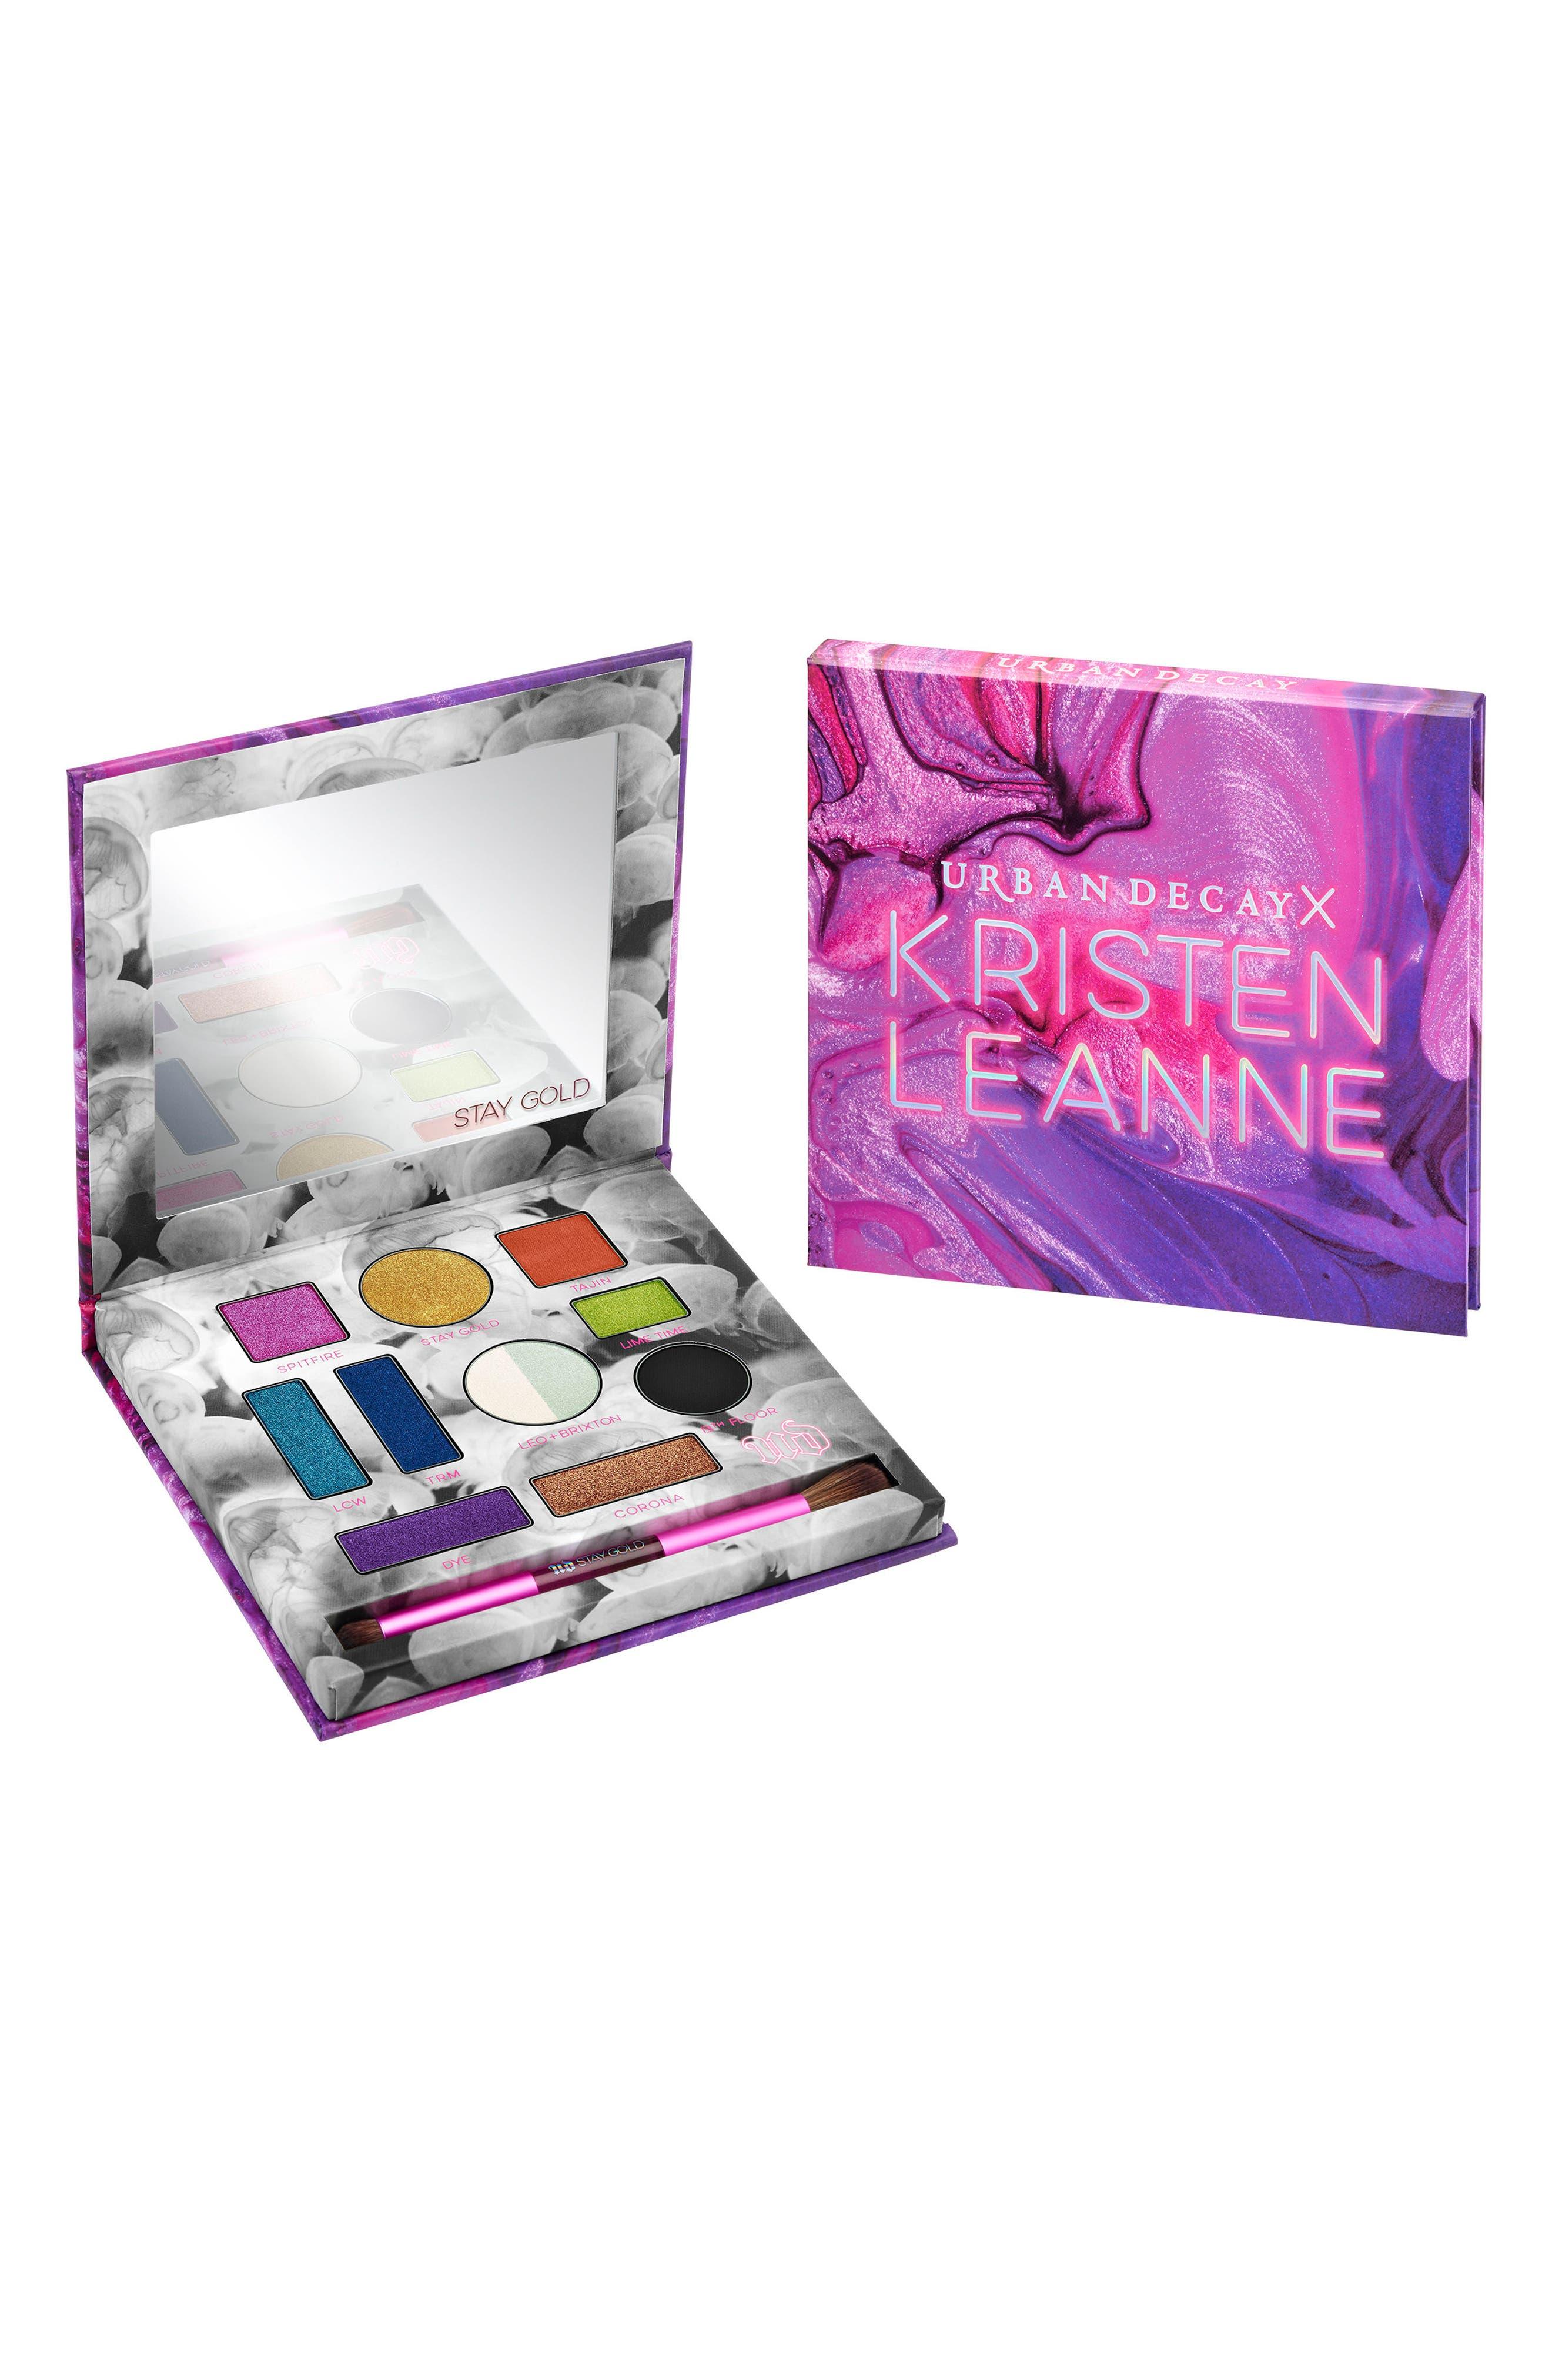 Urban Decay UD x Kristen Leanne Kaleidoscope Dream Eyeshadow Palette (Limited Edition)